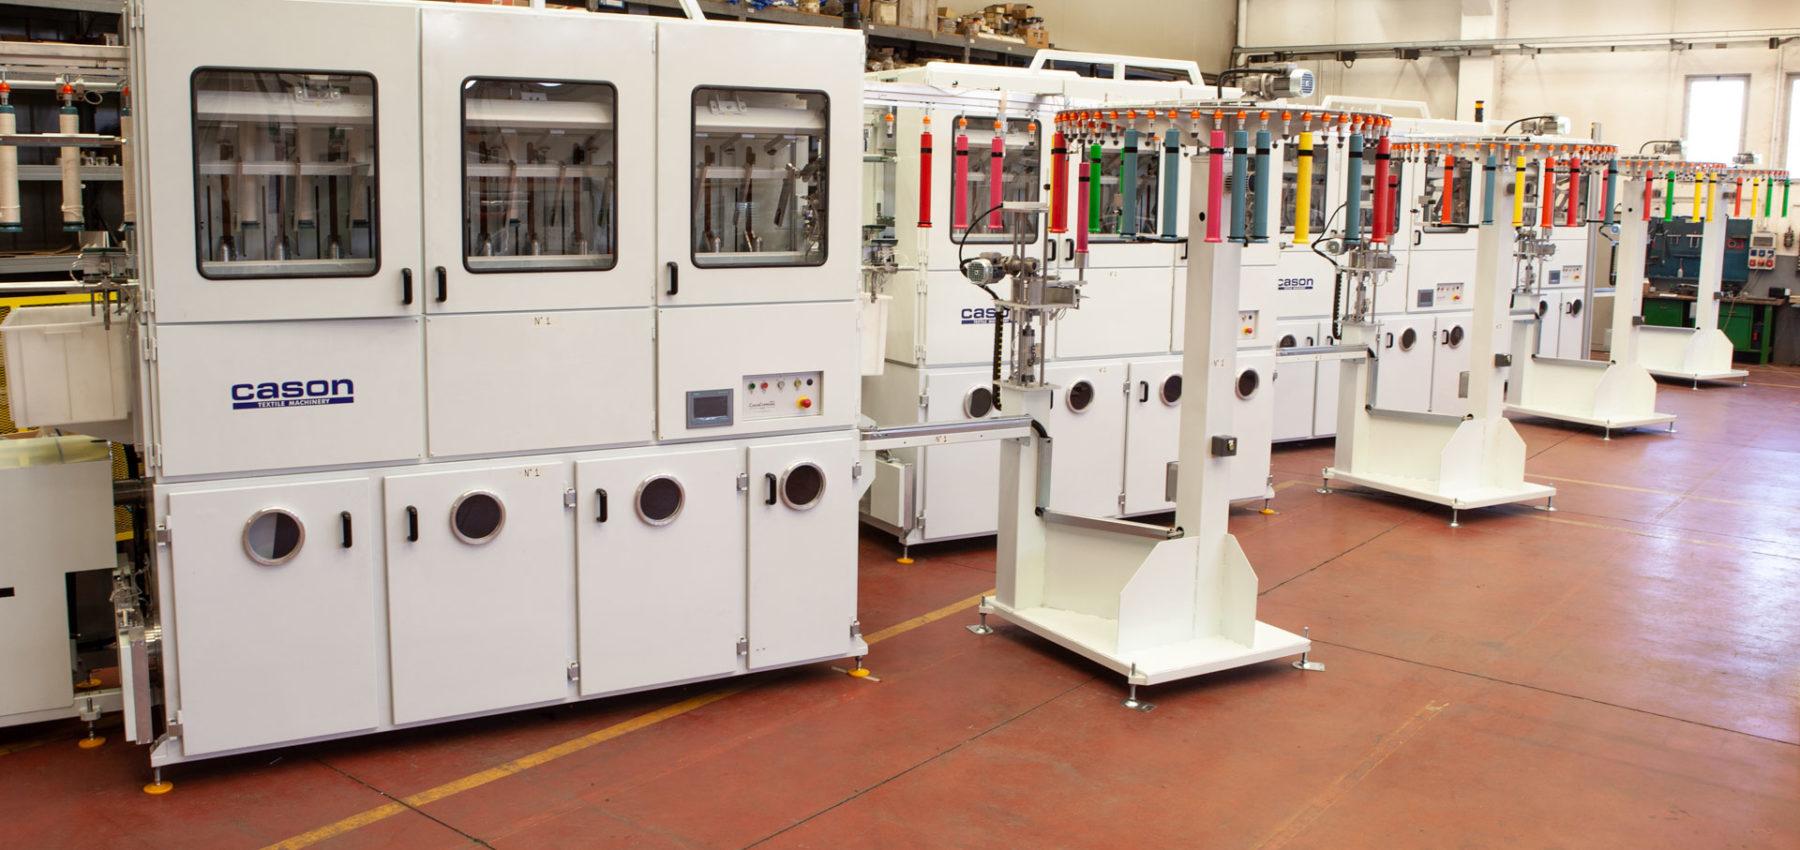 Textile Machines - Cason Companies